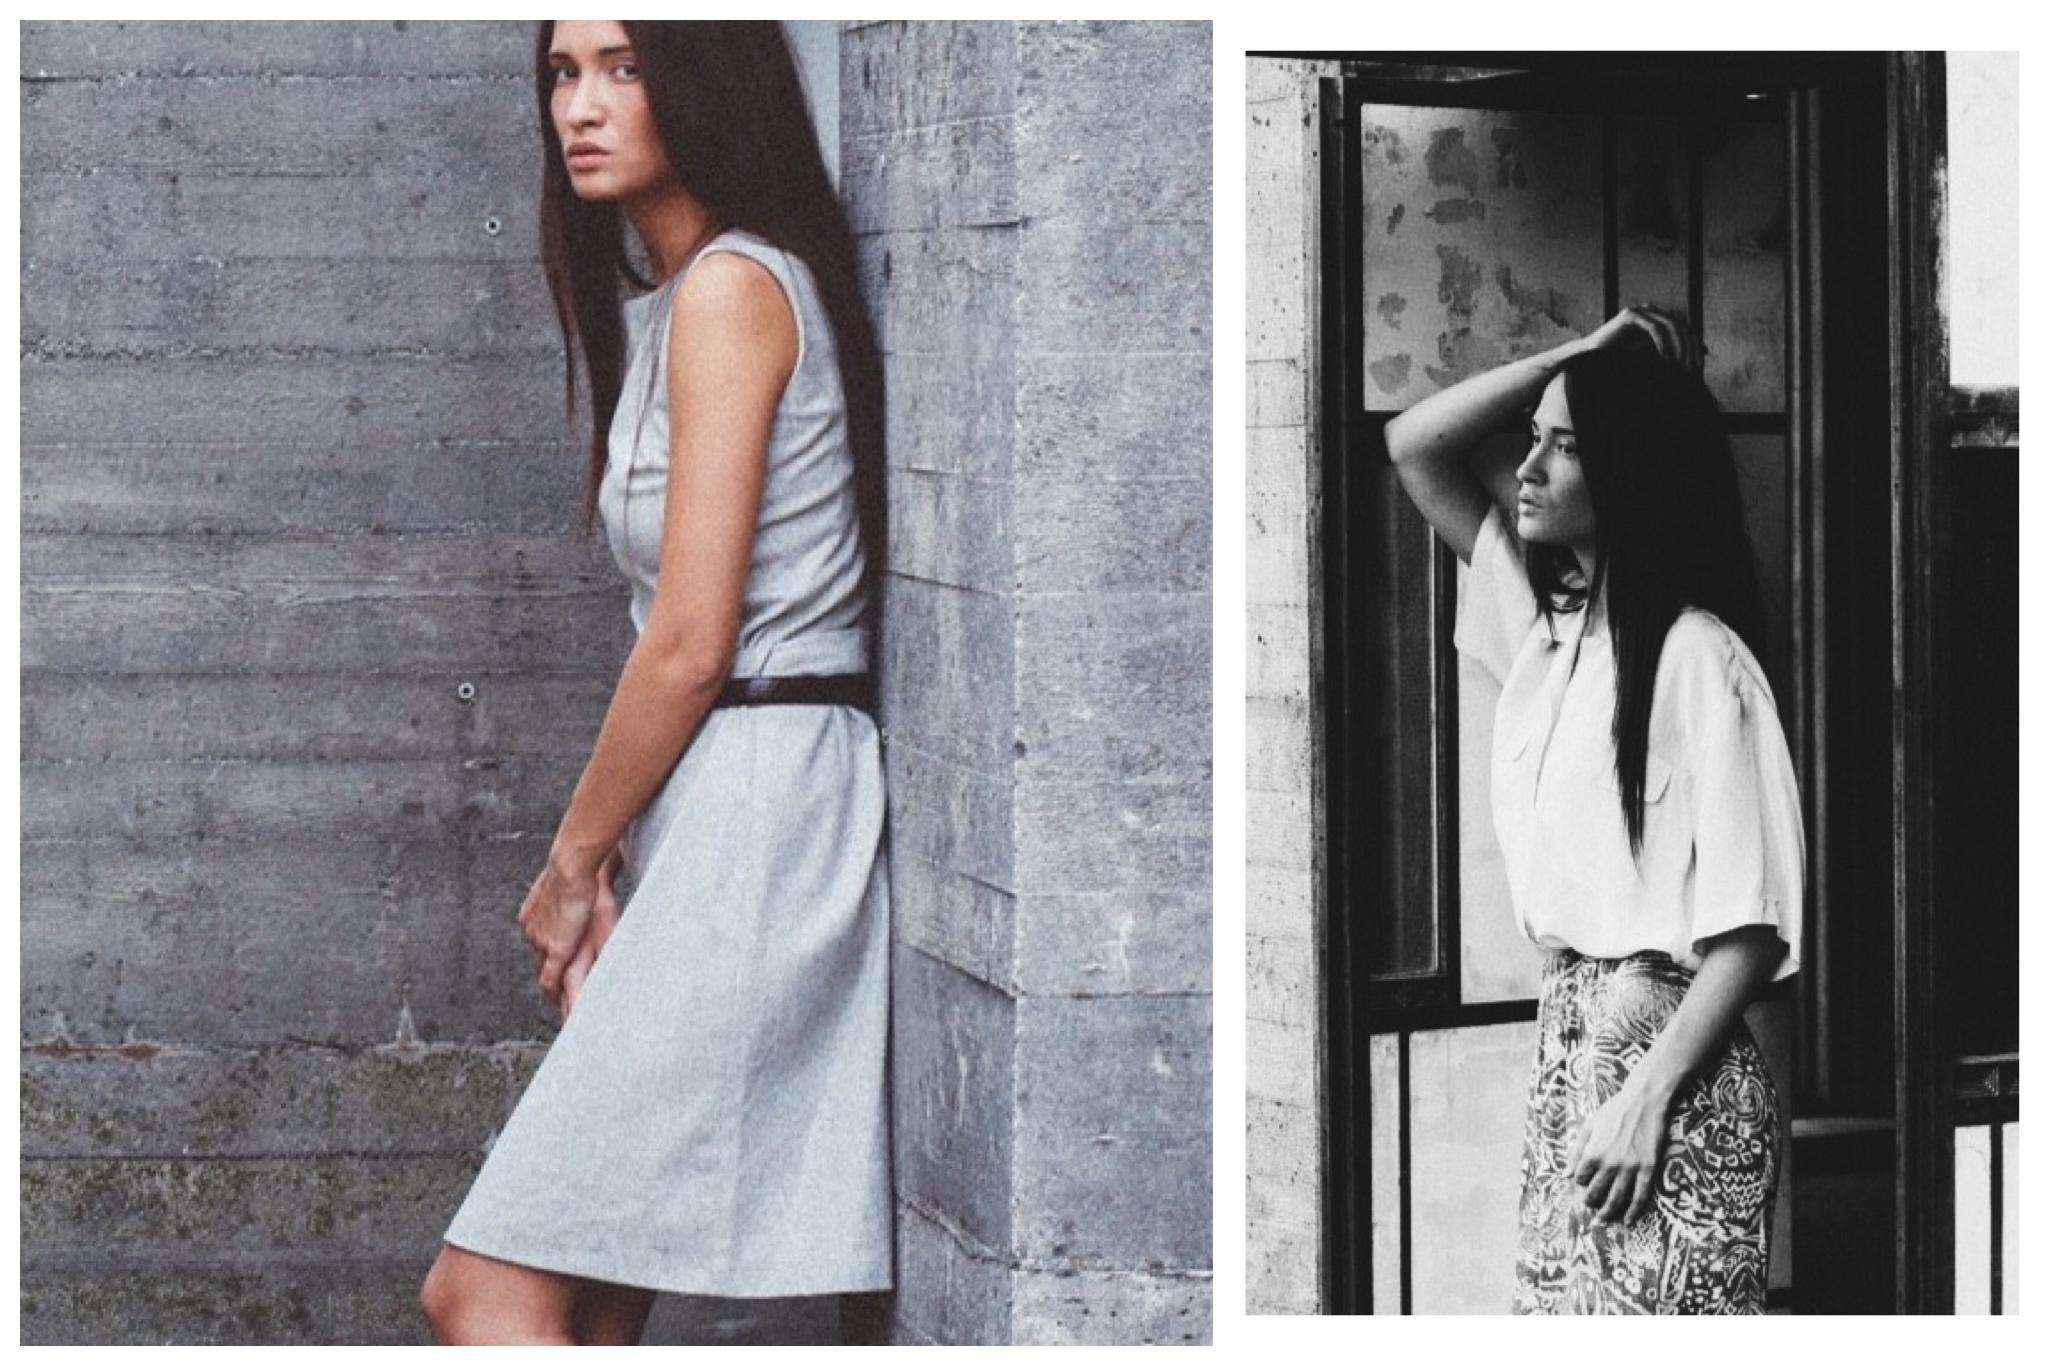 RaissaCampagnola fashion shooti - wilderbiral | ello